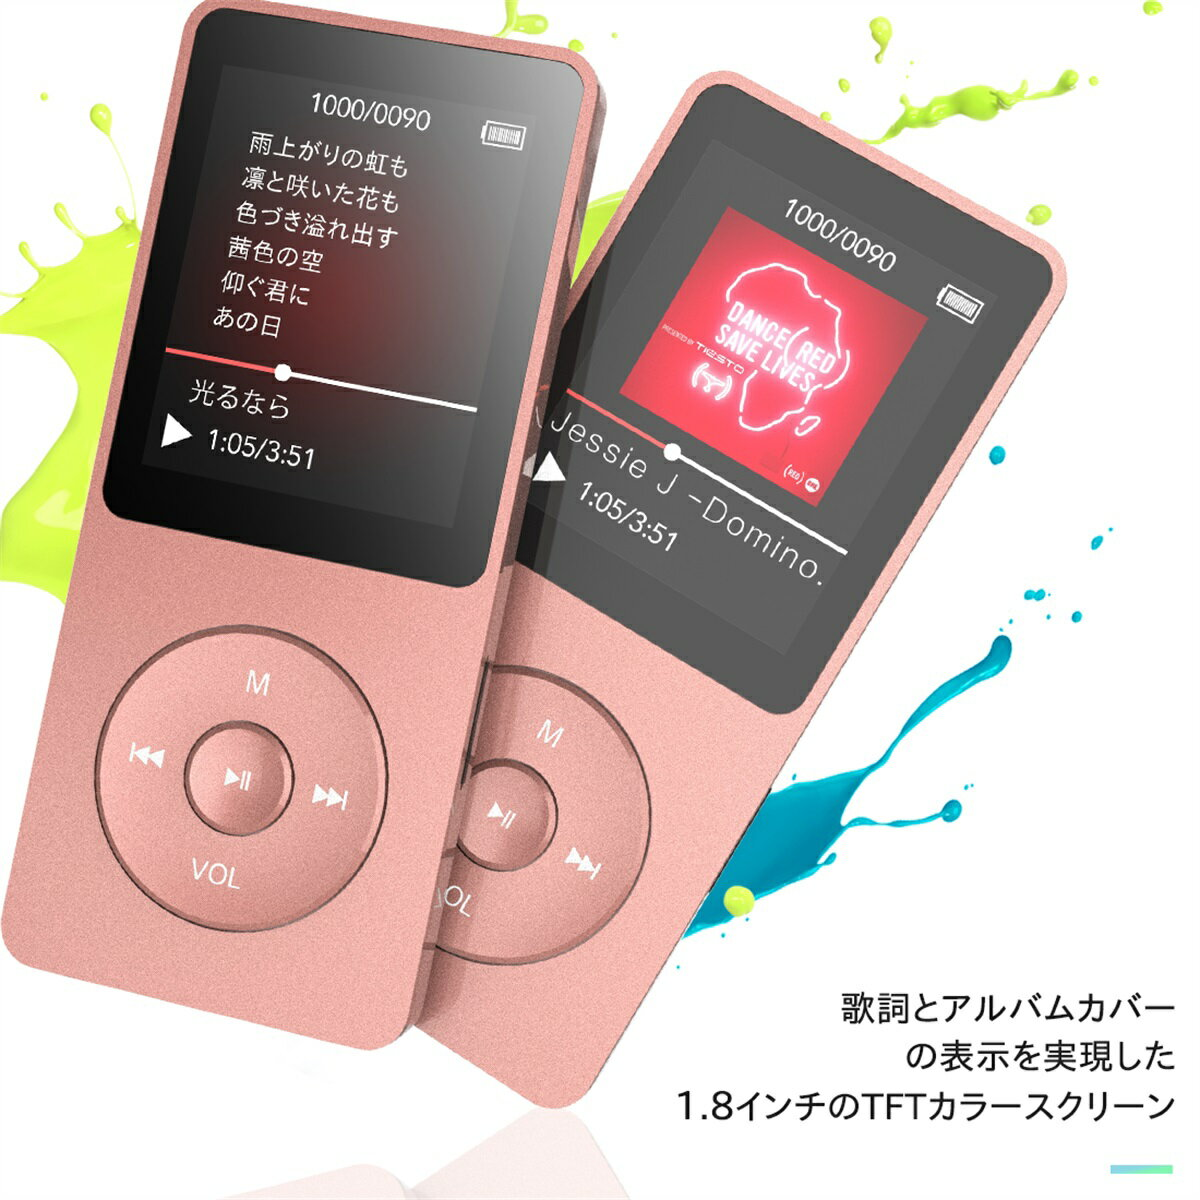 AGPTEK Bluetooth4.0 MP3プレーヤー HIFI高音質 超軽量 A-Bリピート語学機能/歩数計/FMラジオ 多機能 内蔵8GB マイクロSDカード128GBまで対応 A02TBluetooth進級版 ローズゴールド